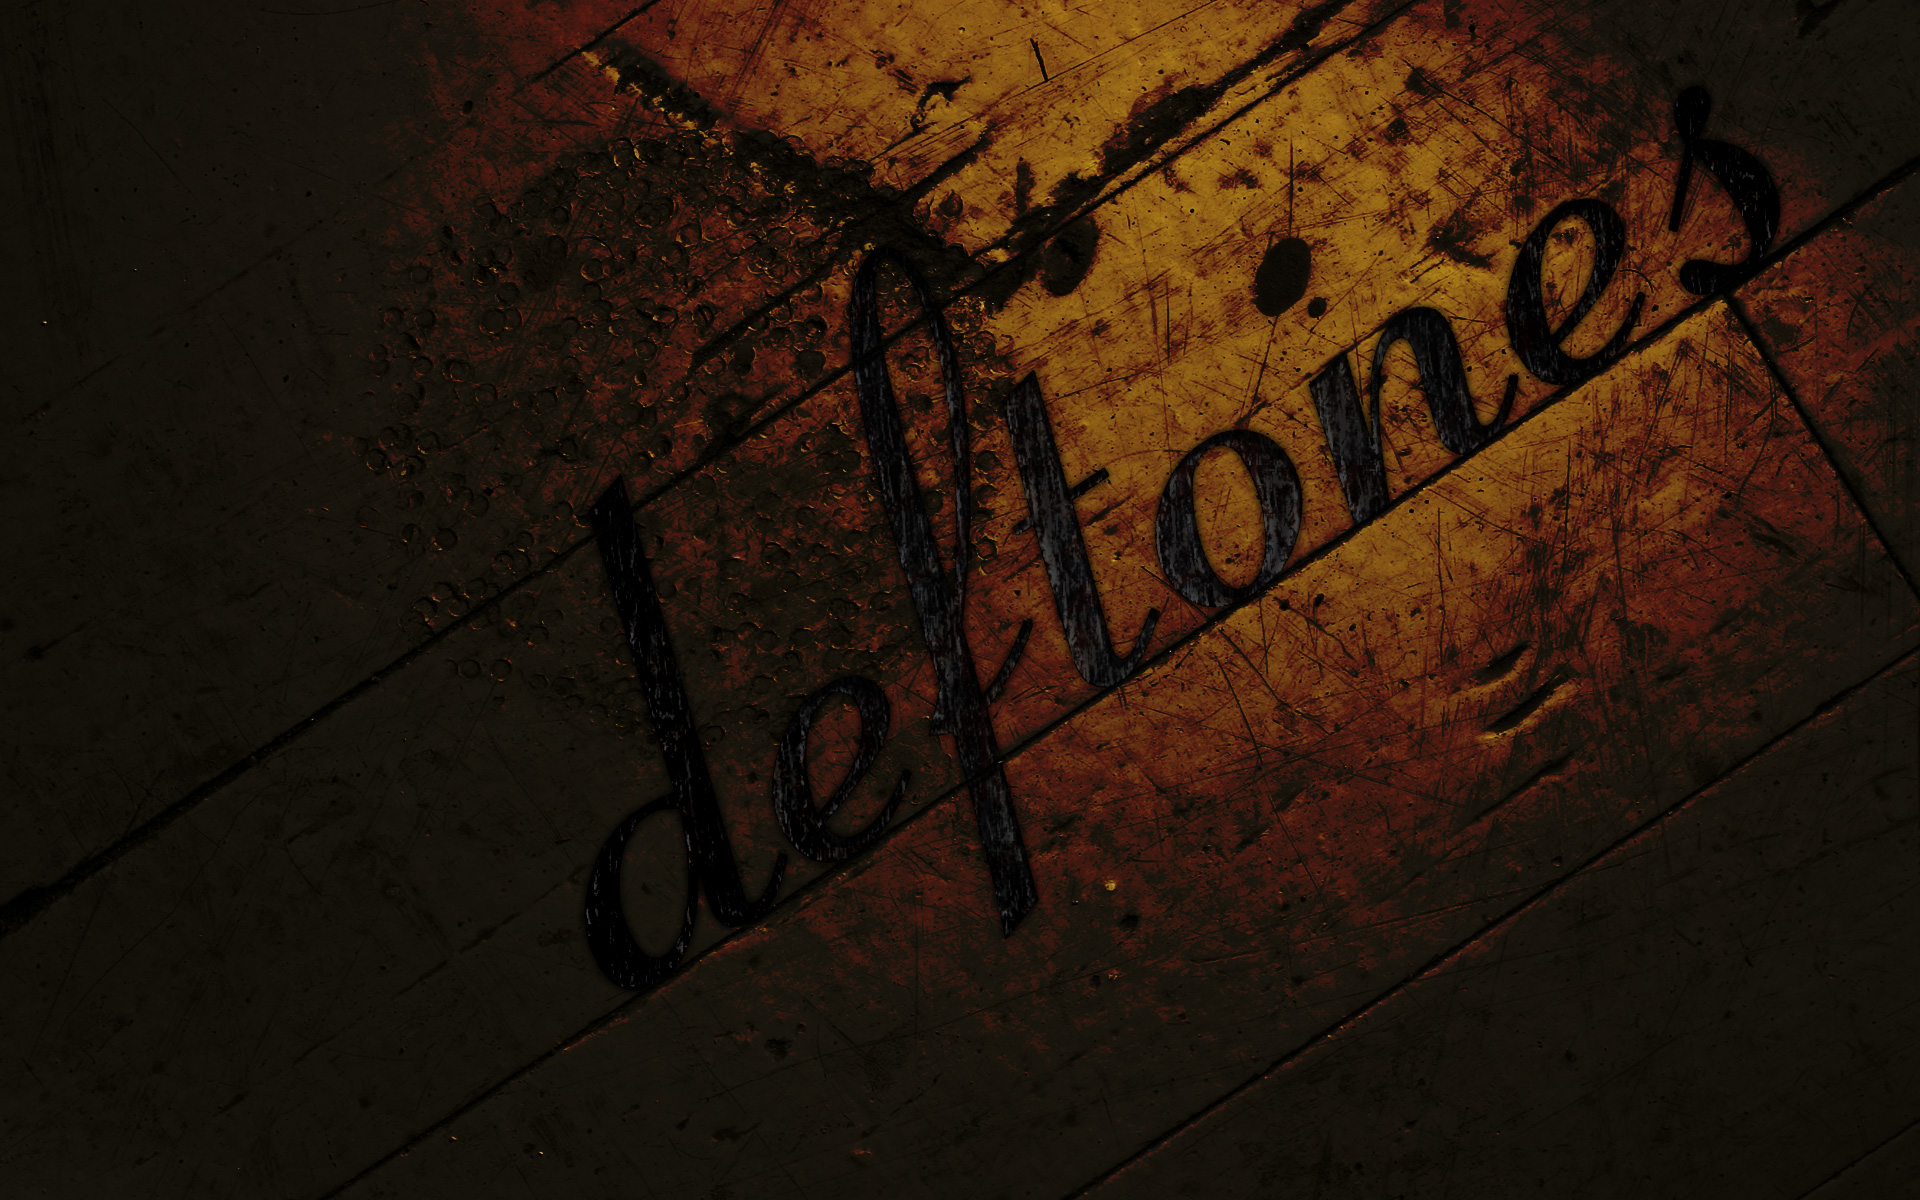 deftones hd wallpaper color palette tags deftones category general 1920x1200